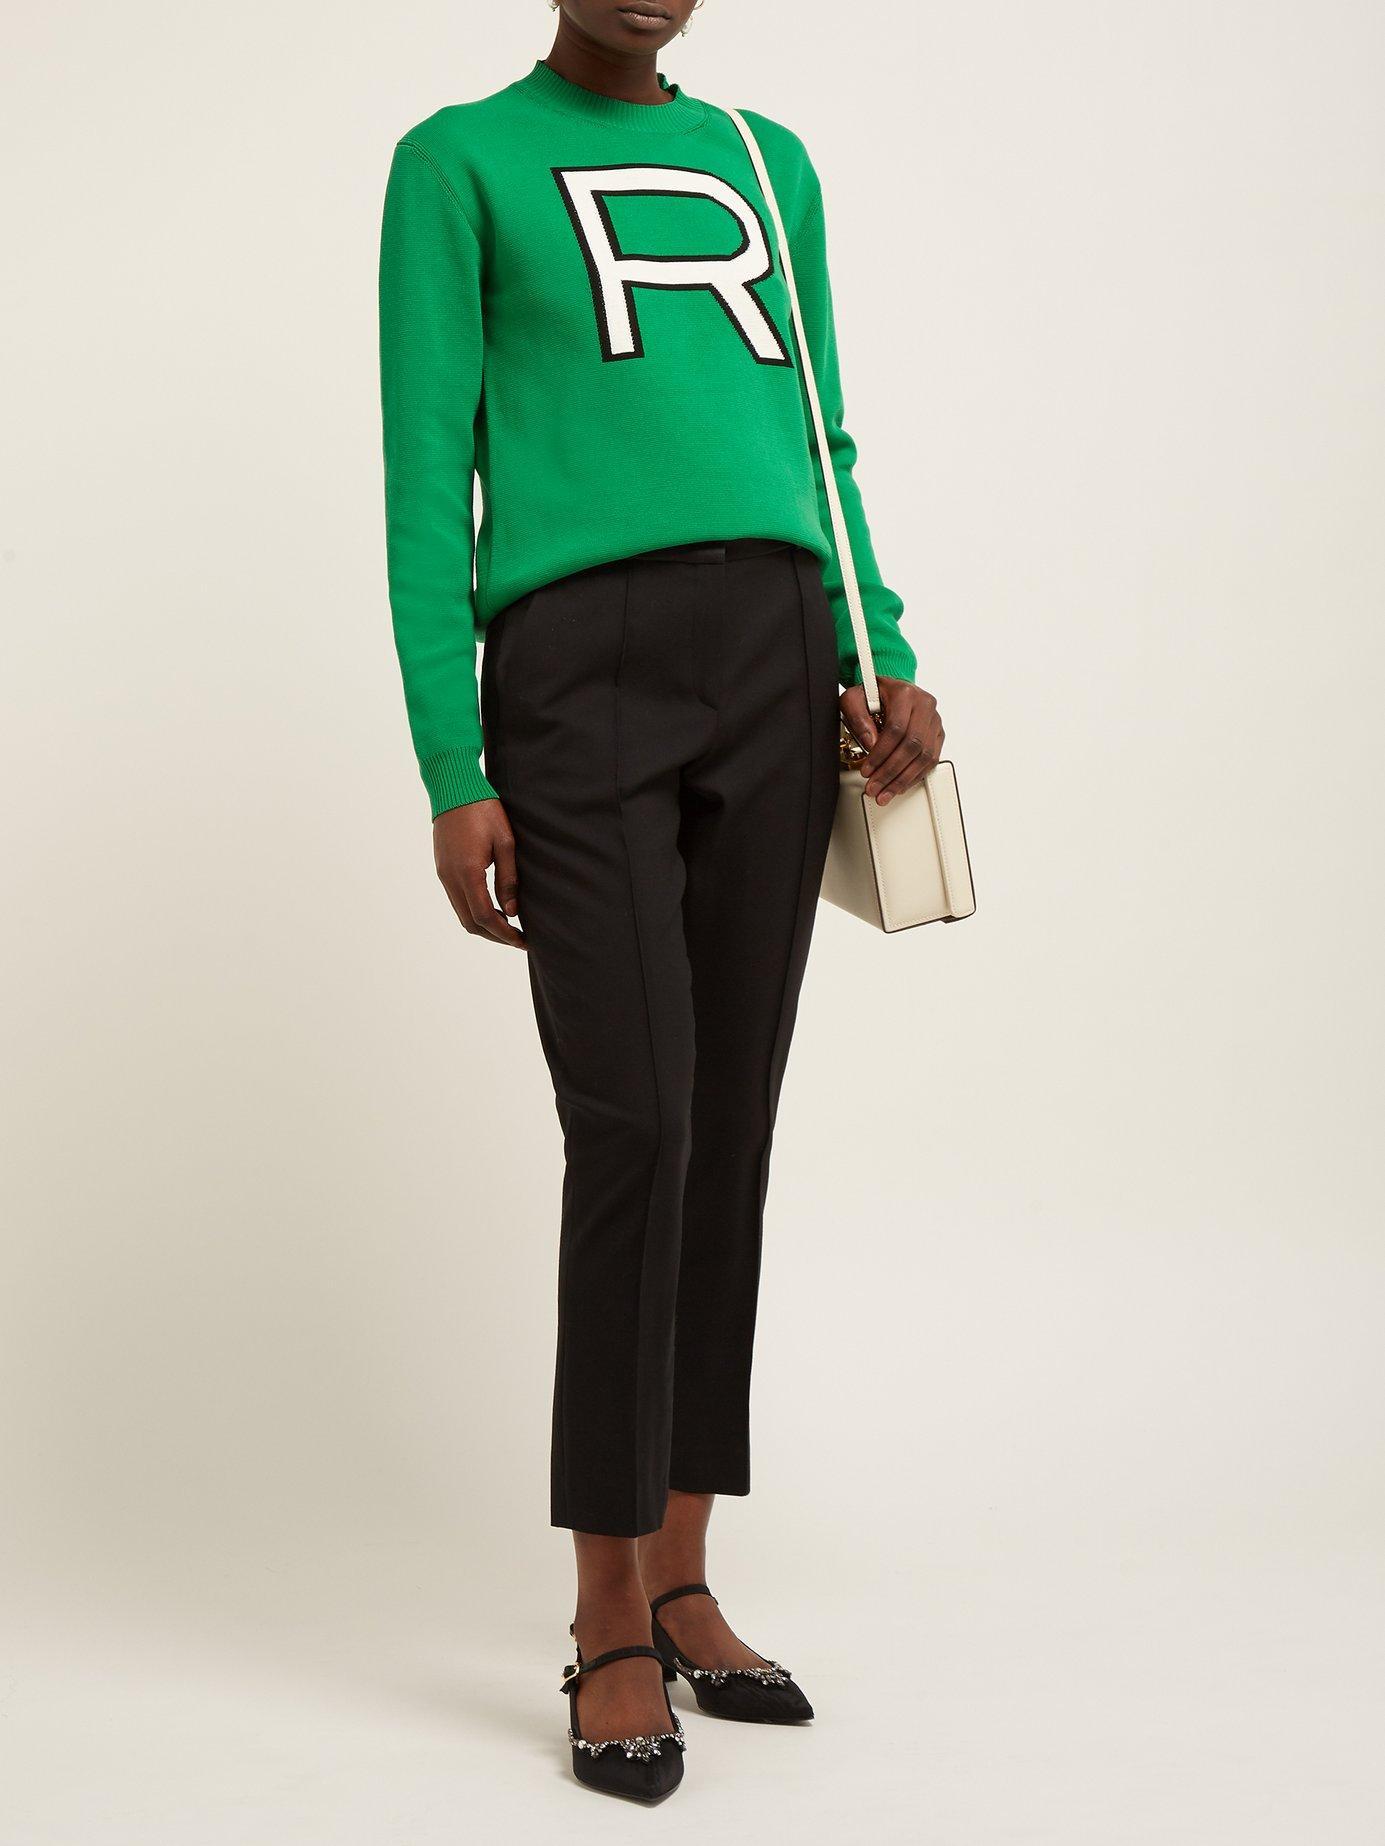 ddee642c0d Rochas - Green R Logo Intarsia Cotton Sweater - Lyst. View fullscreen